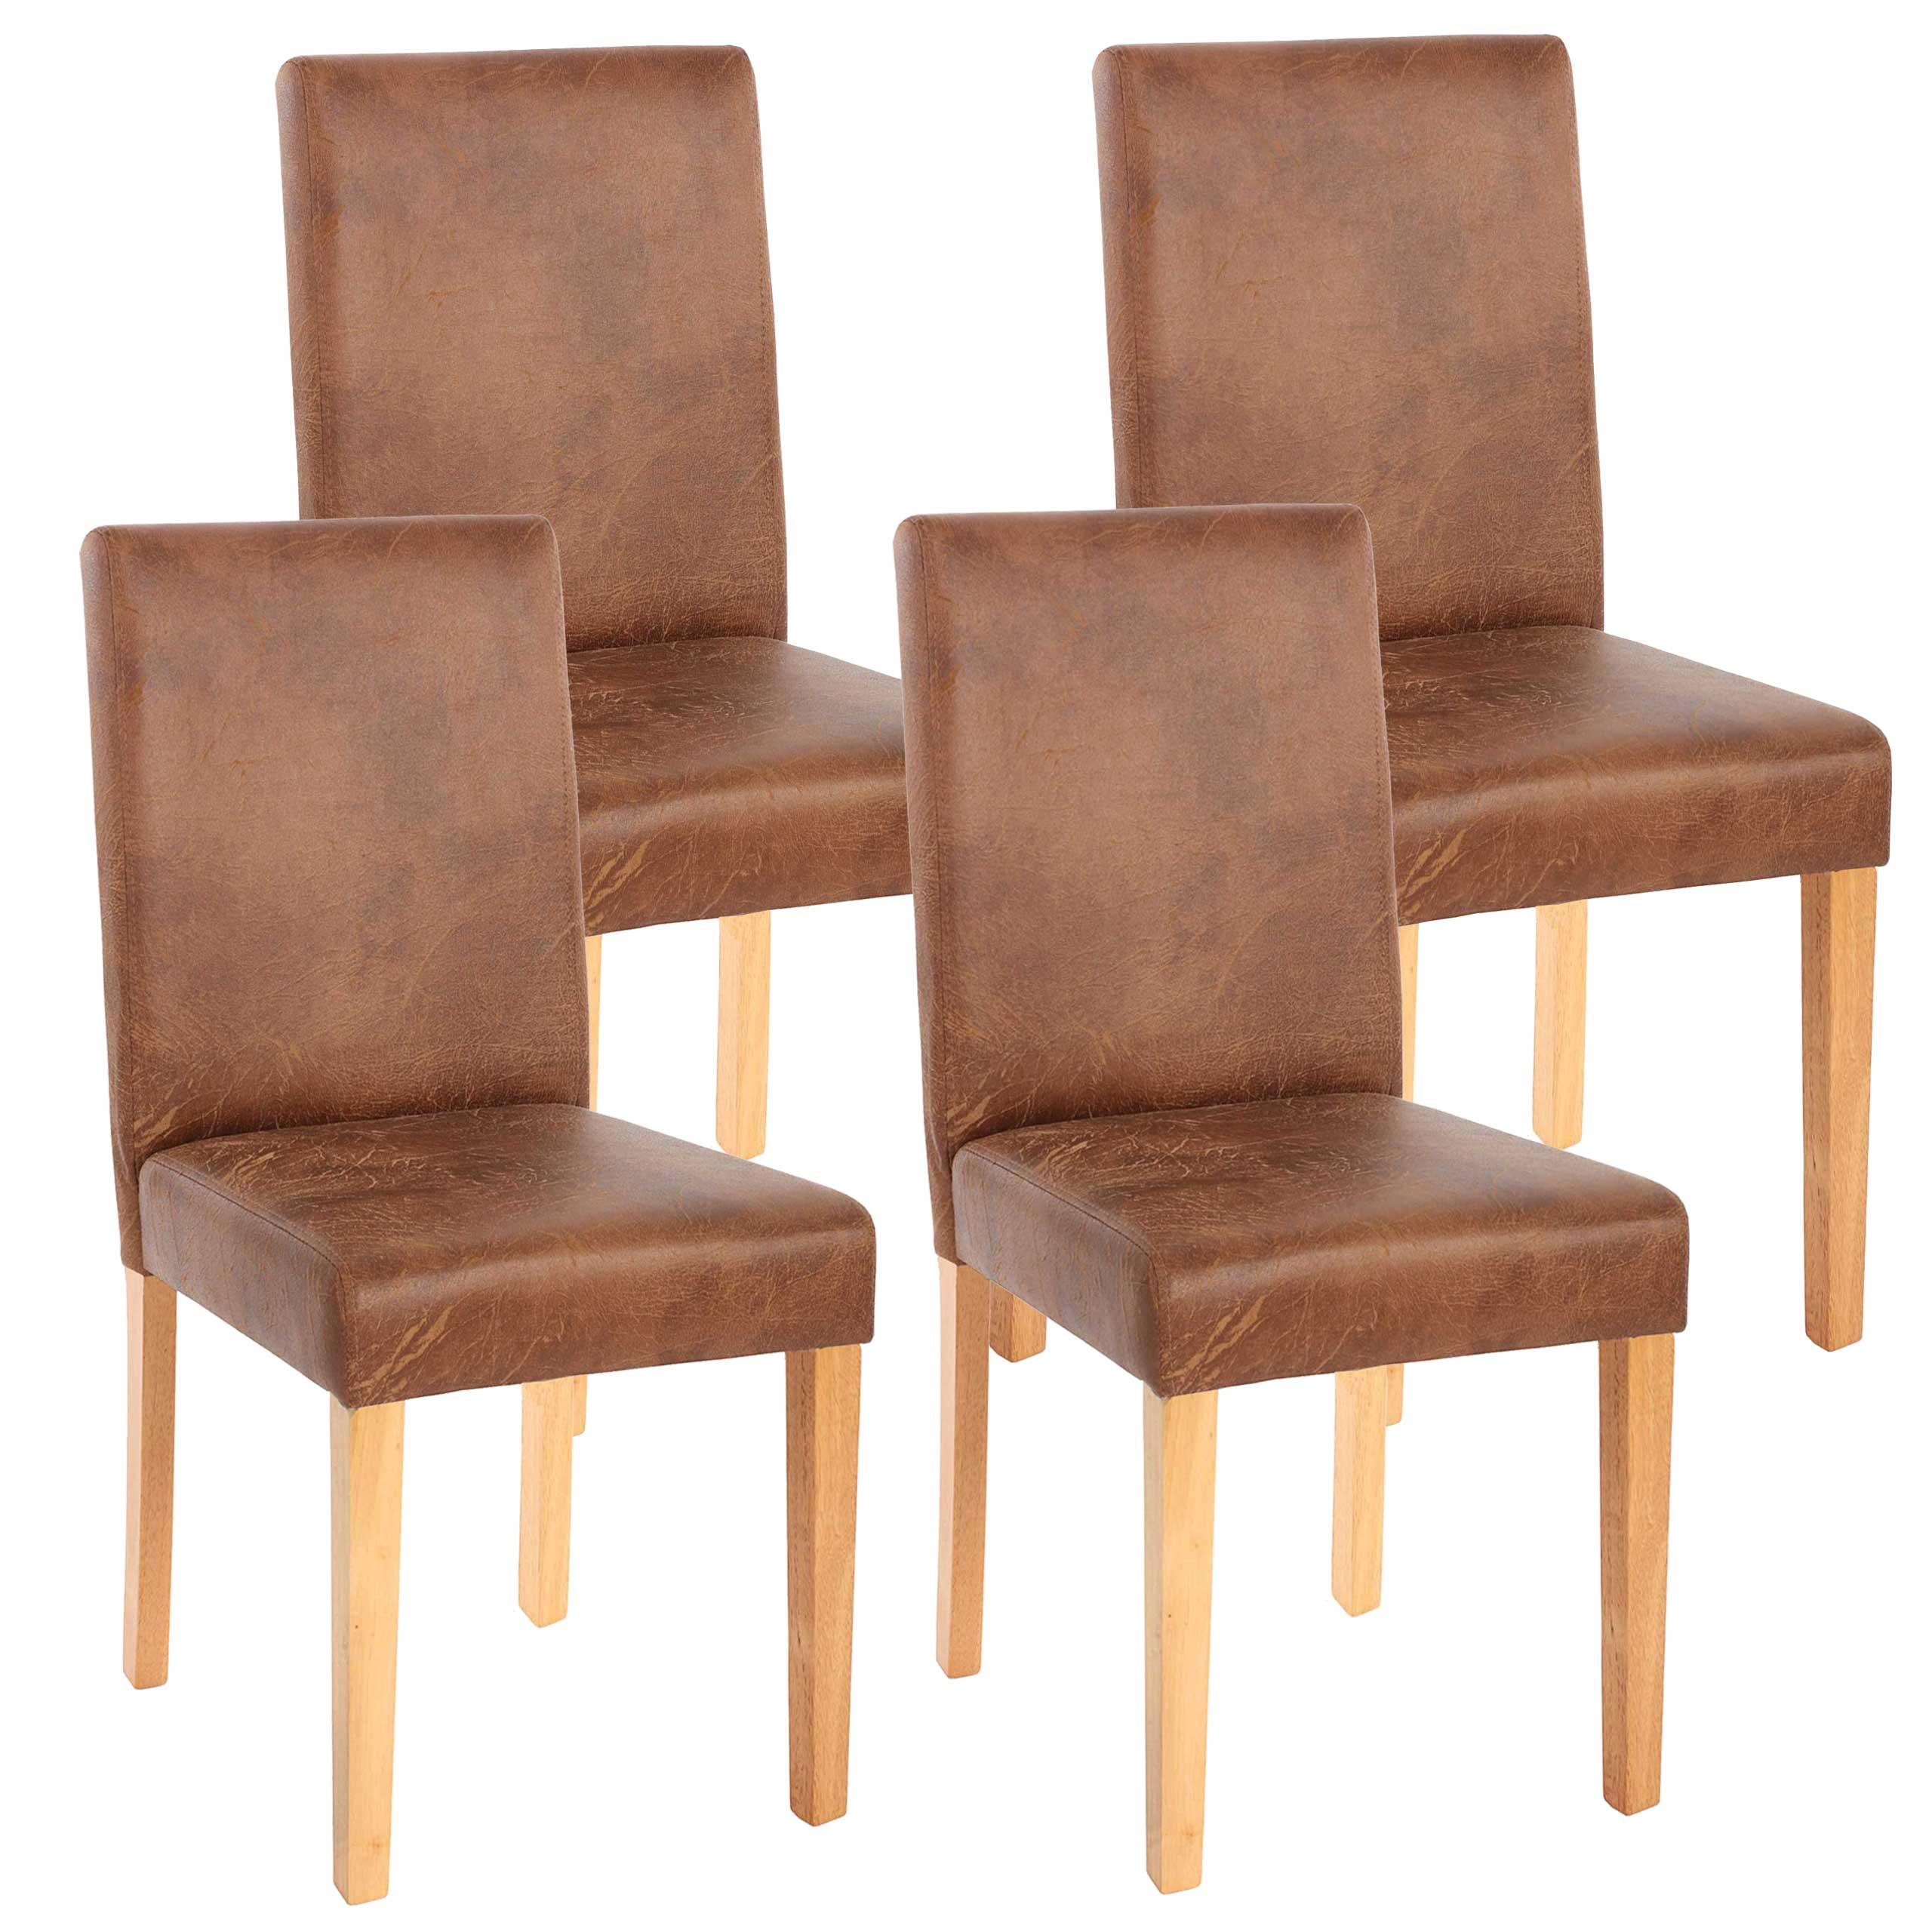 4x esszimmerstuhl stuhl lehnstuhl littau textil wildlederimitat helle beine. Black Bedroom Furniture Sets. Home Design Ideas